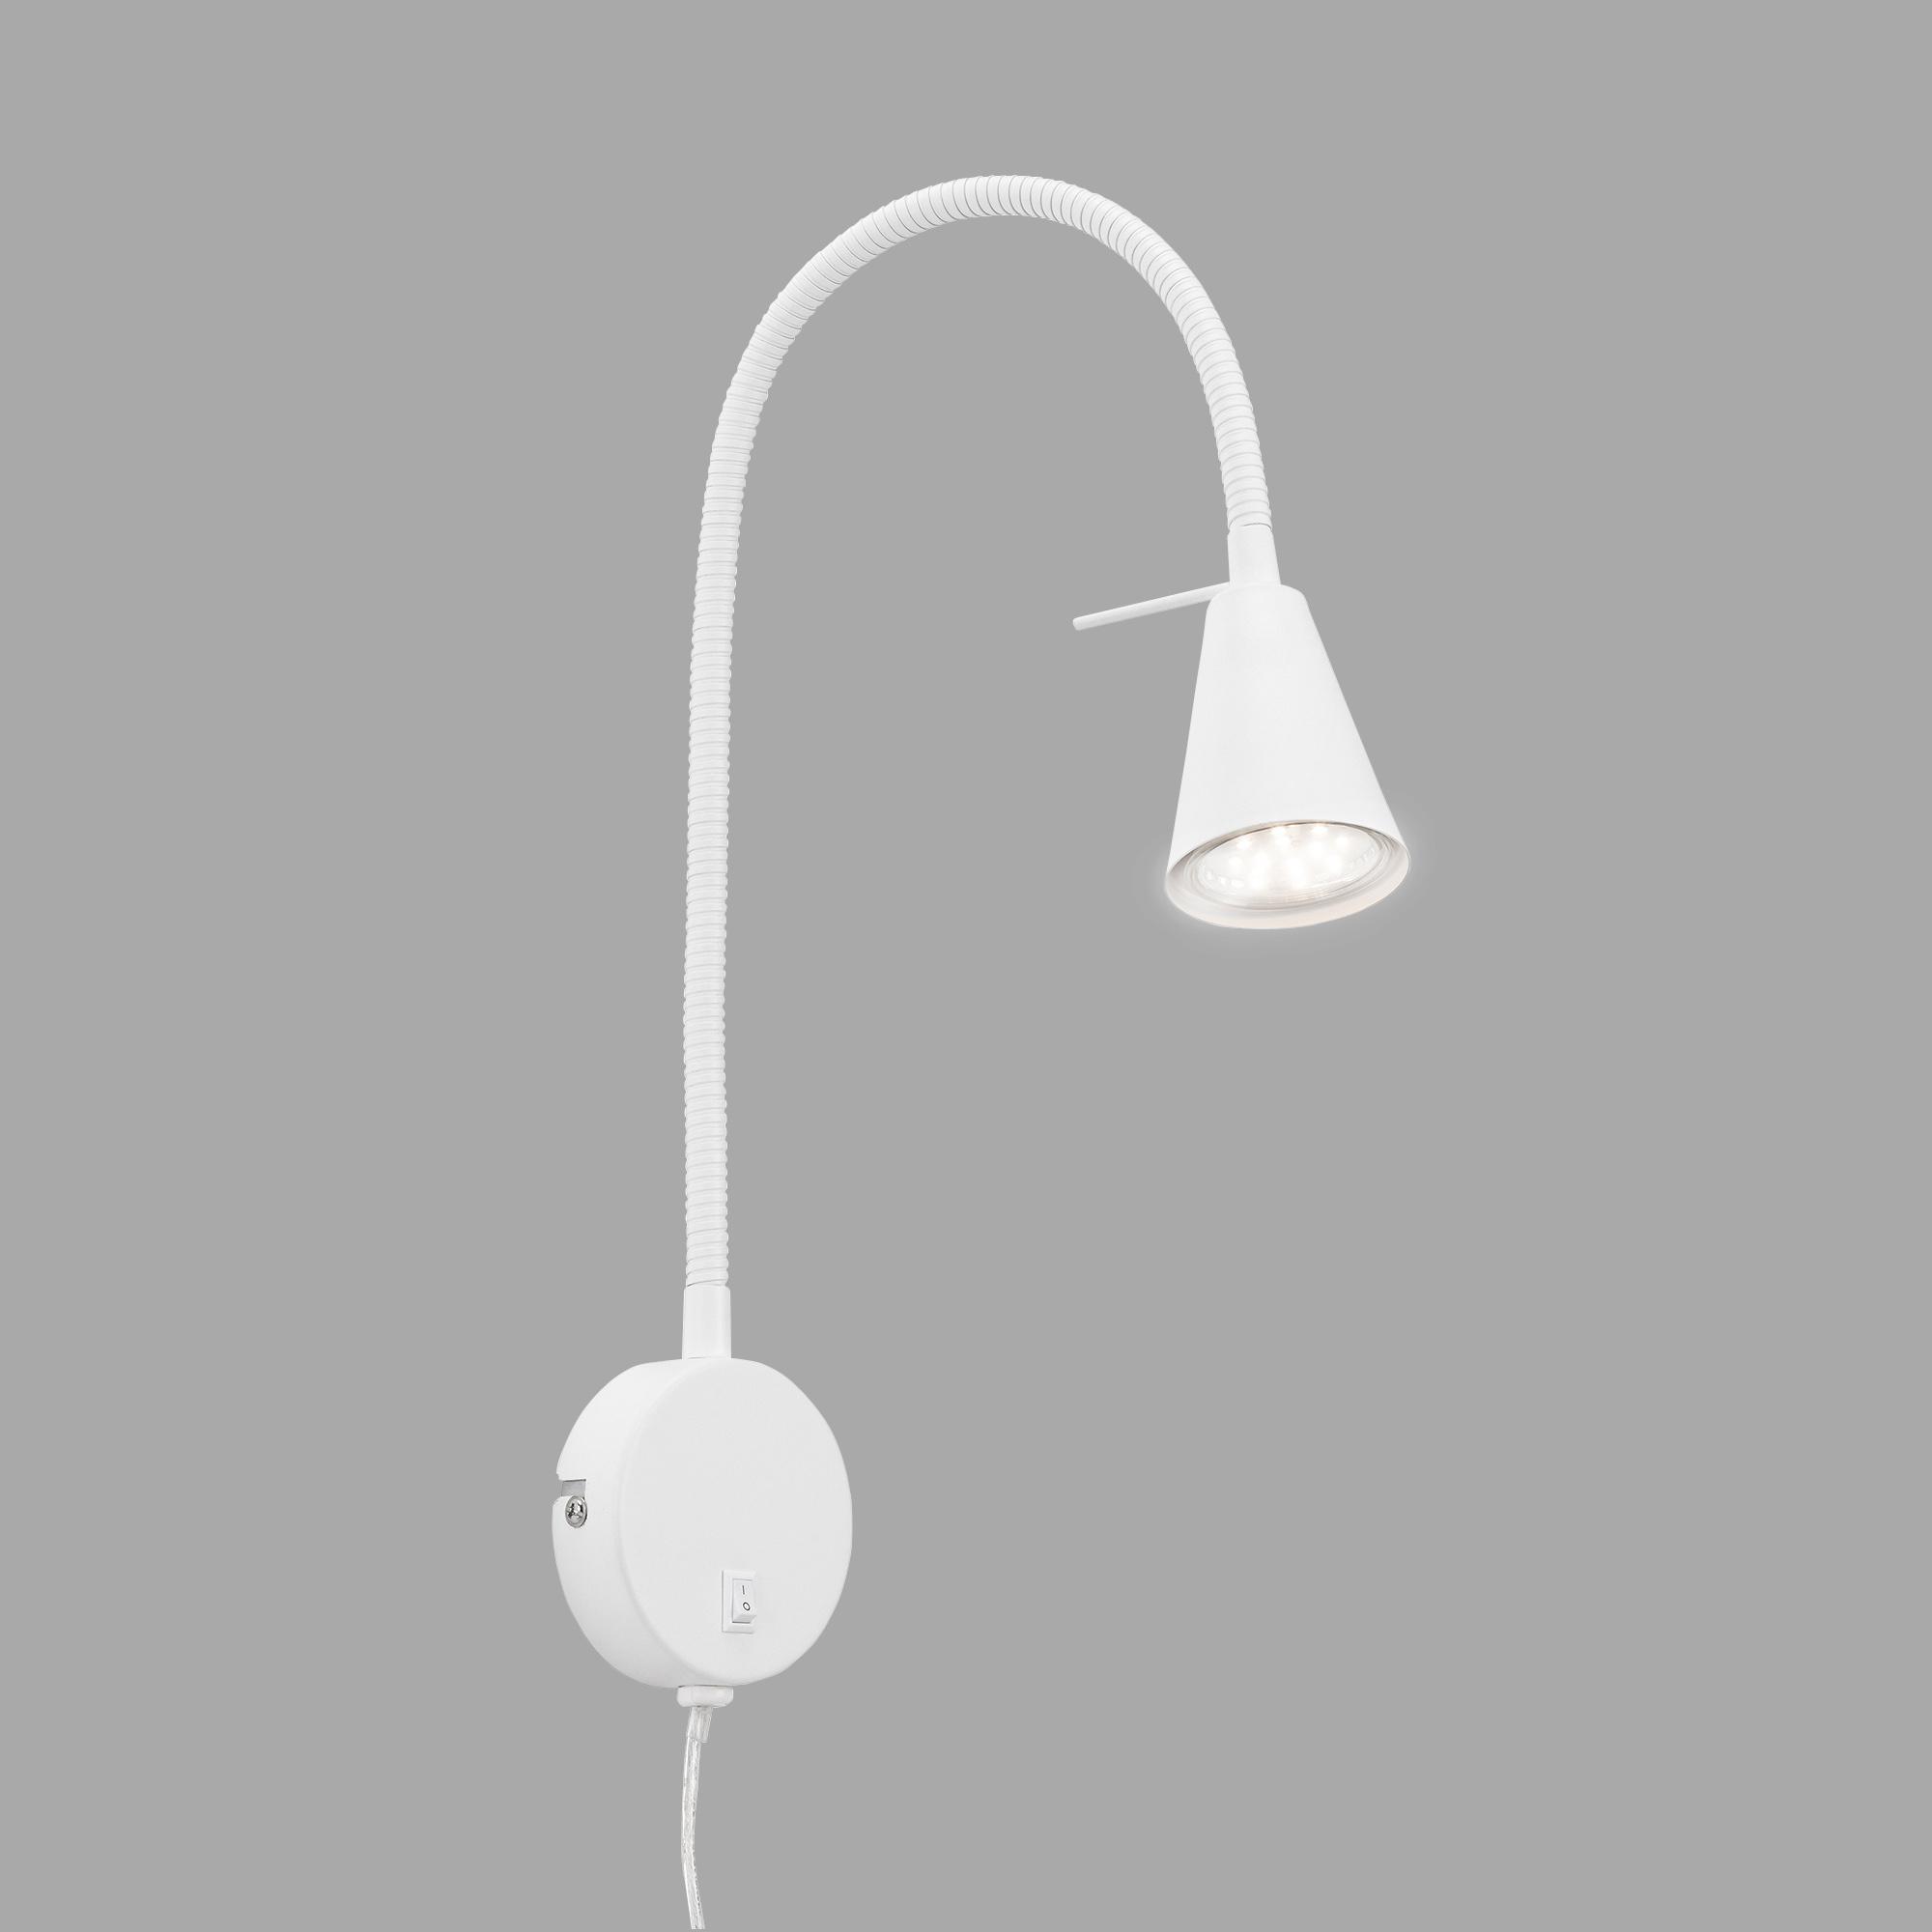 LED Wandleuchte, 45 cm, 5 W, Weiss